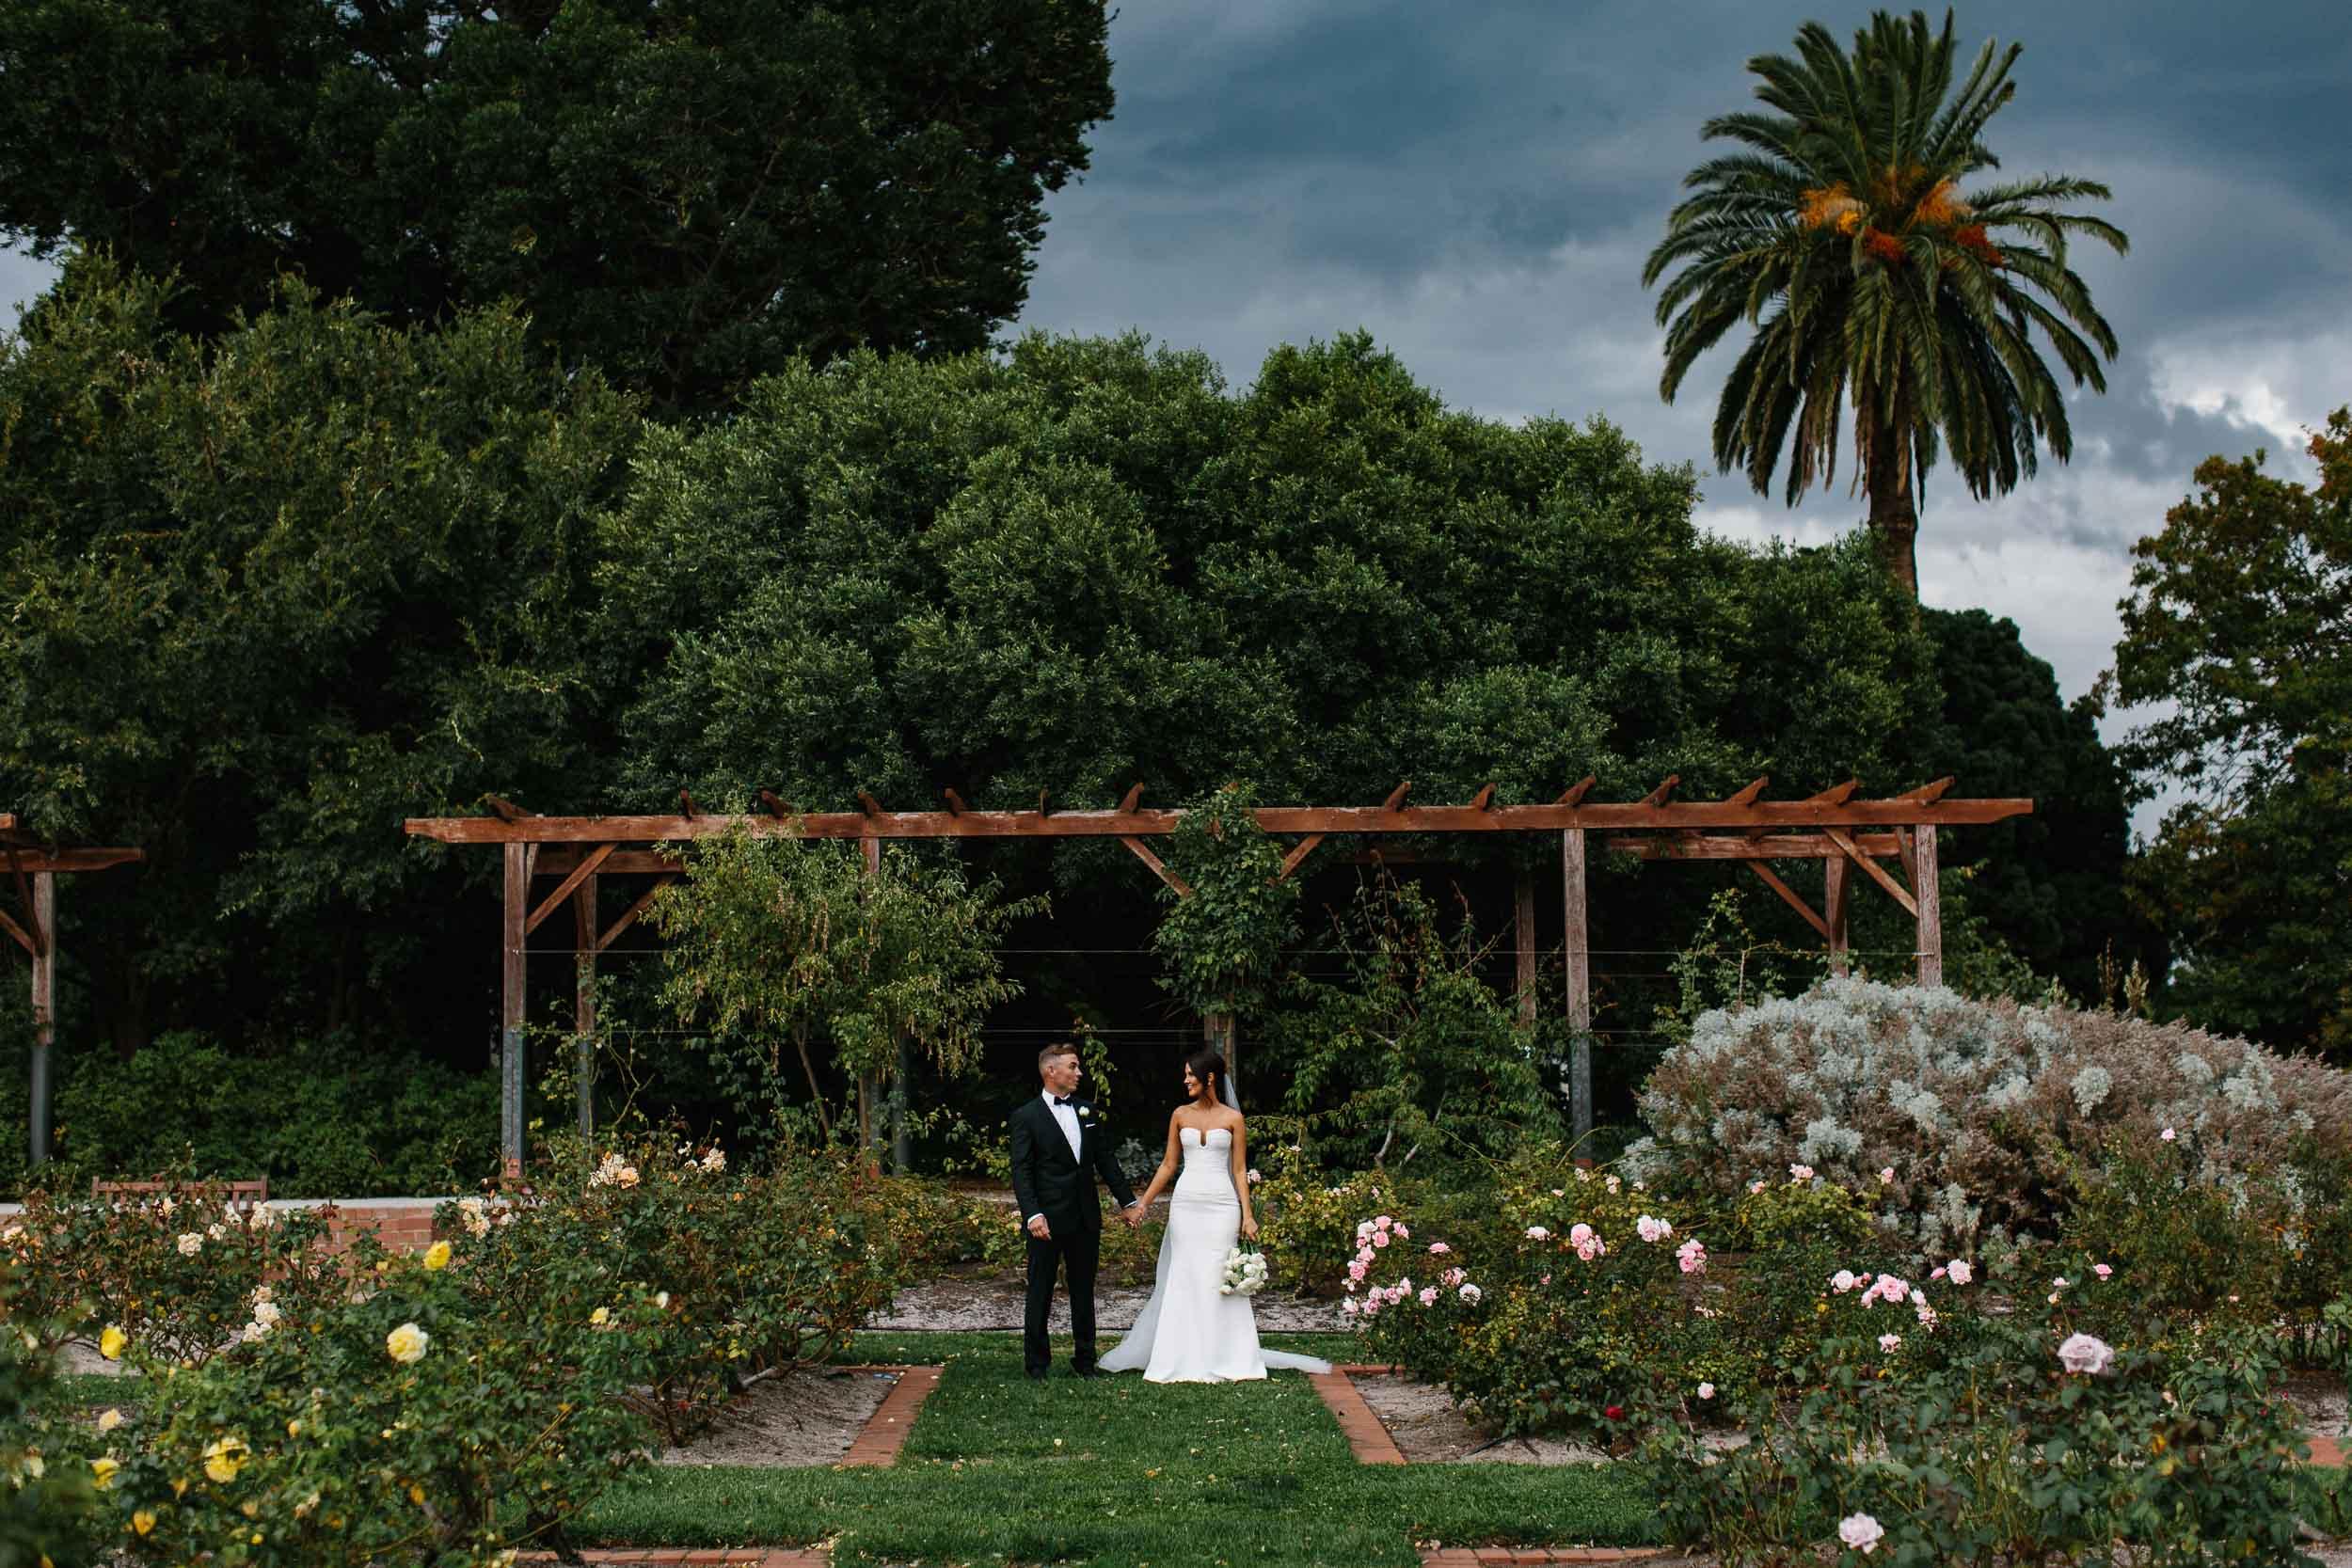 Kas-Richards-Melbourne-Garden-Wedding-Aerial-South-Whark-Georgia-Young-Couture-285.jpg